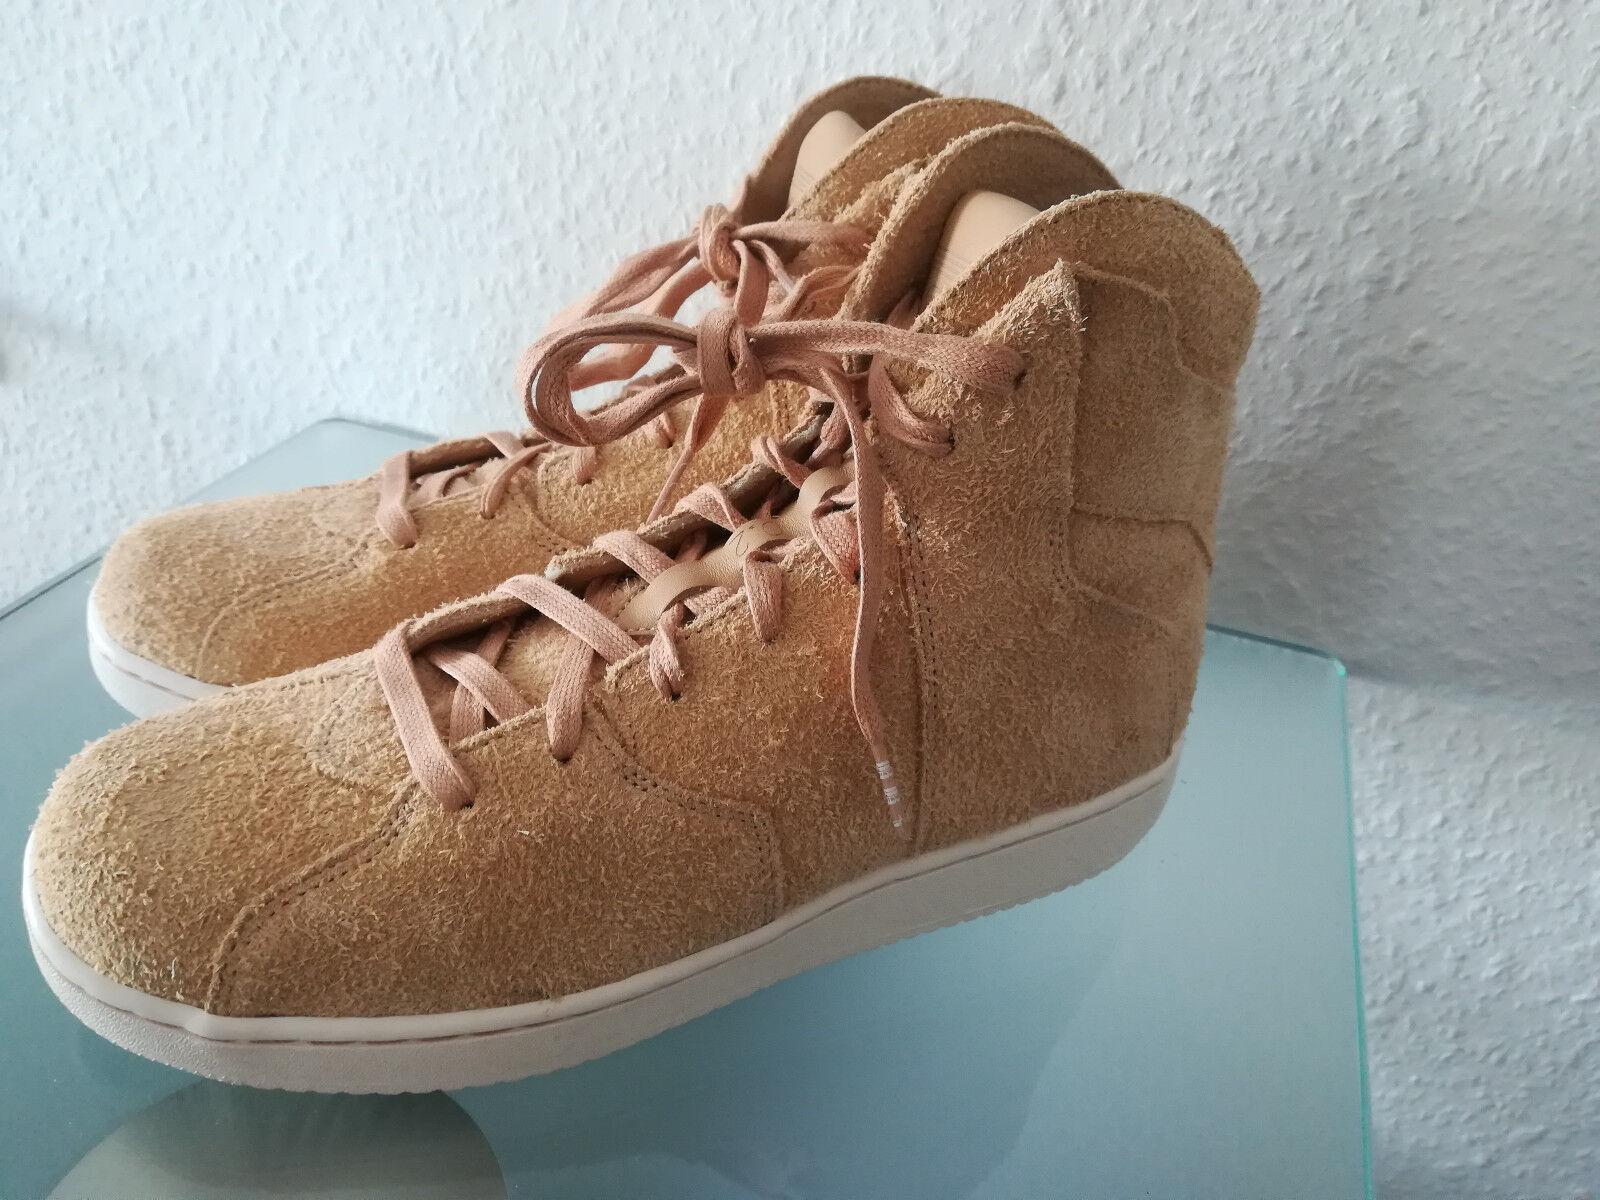 NIKE Brand Jordan Jordan Jordan Westbrook 0.2 Uomo 854563-200 Nuovo Taglia 42 555536